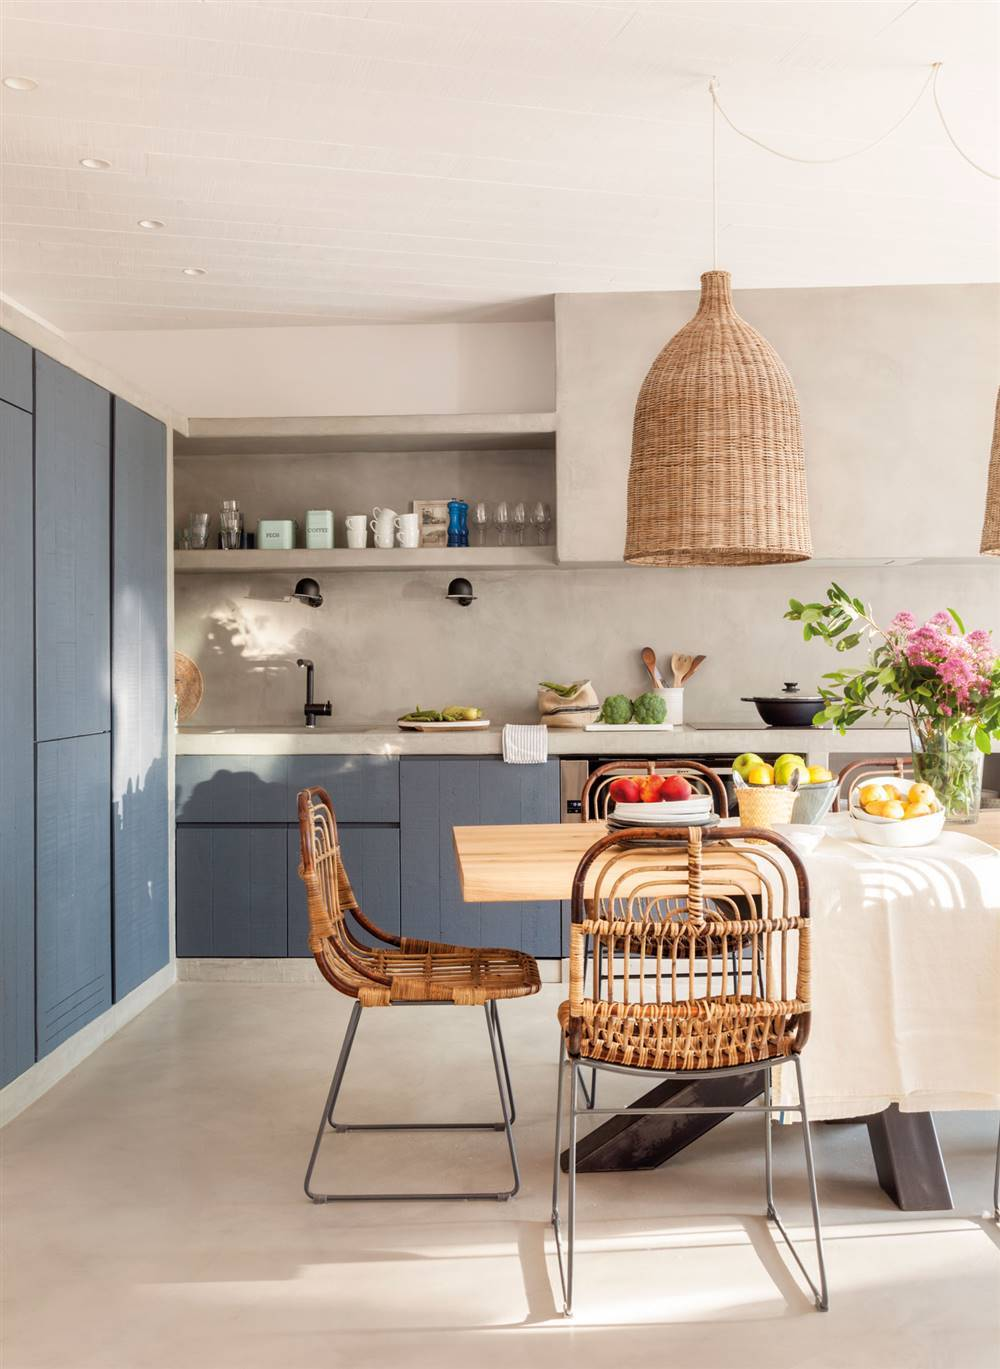 Paredes de la cocina con o sin azulejos for Pintura cocina pato azul